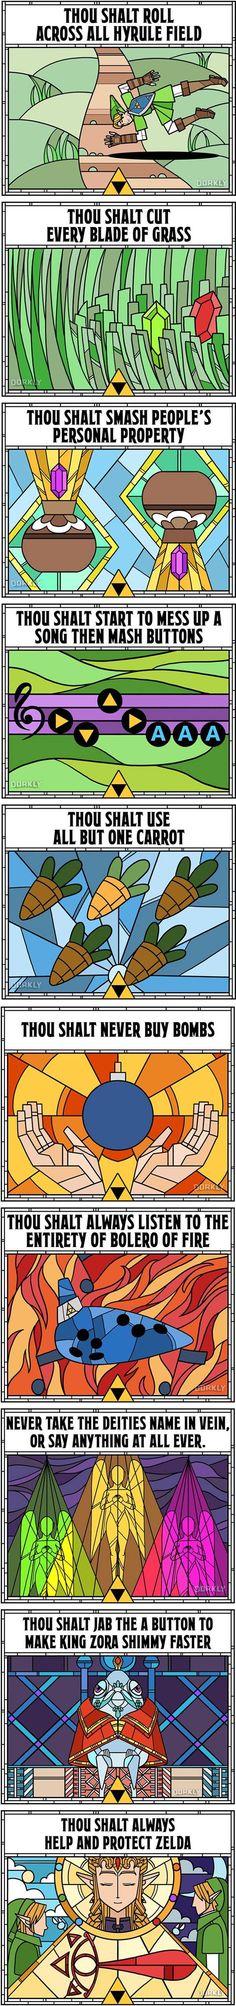 10 Commandments Of Ocarina Of Time - 9GAG